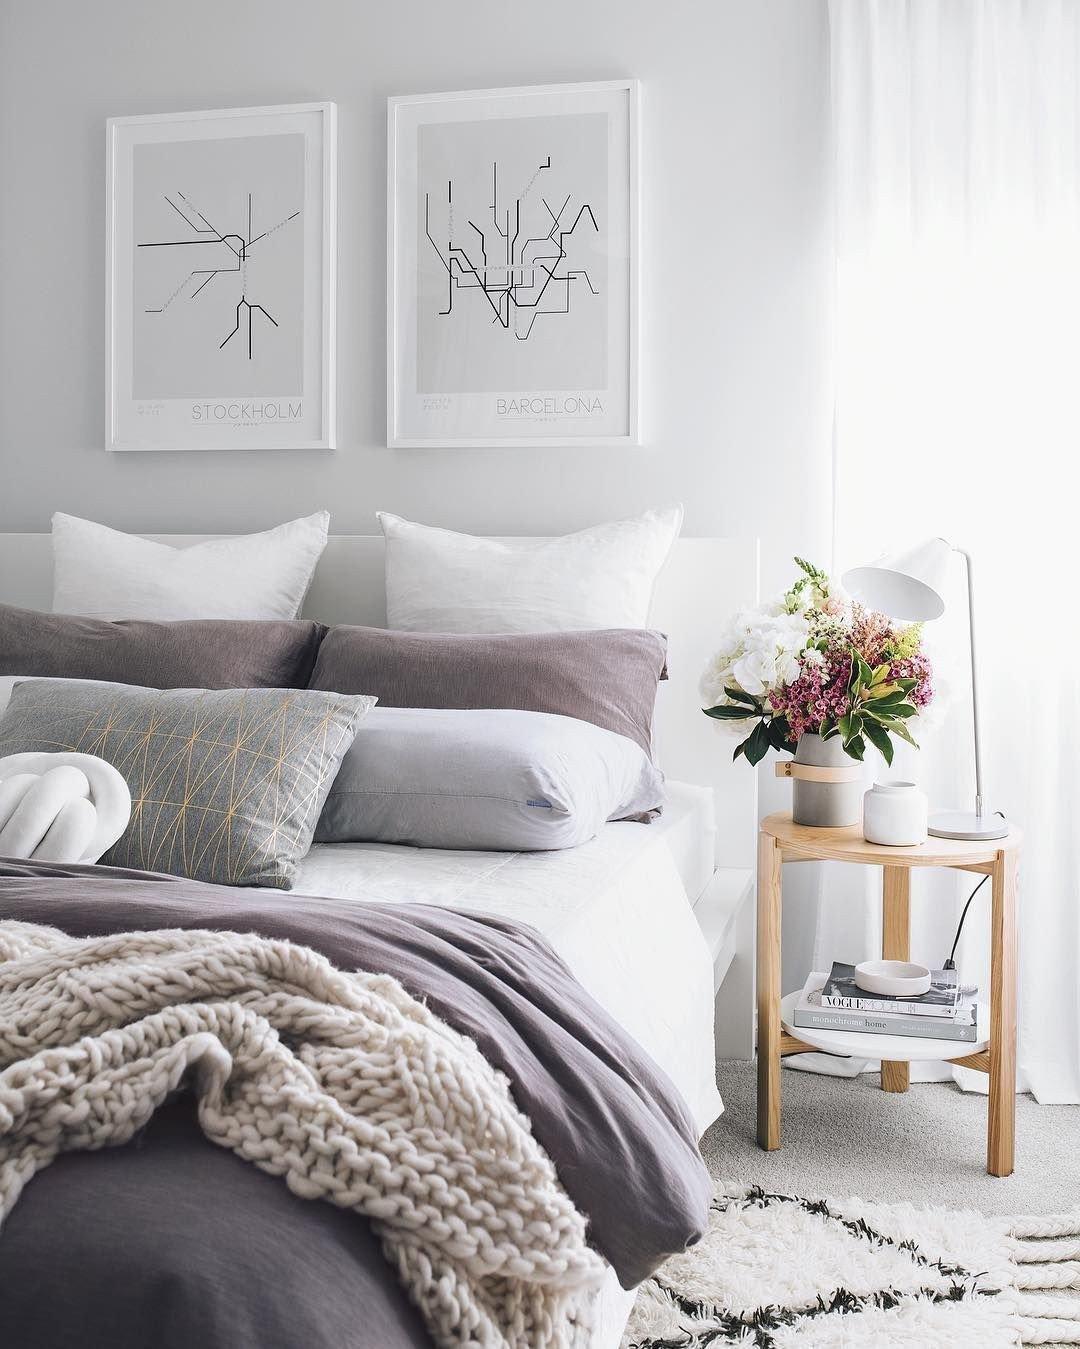 Blue and Gold Bedroom Luxury 24 Grey and Gold Wall Art Kunuzmetals